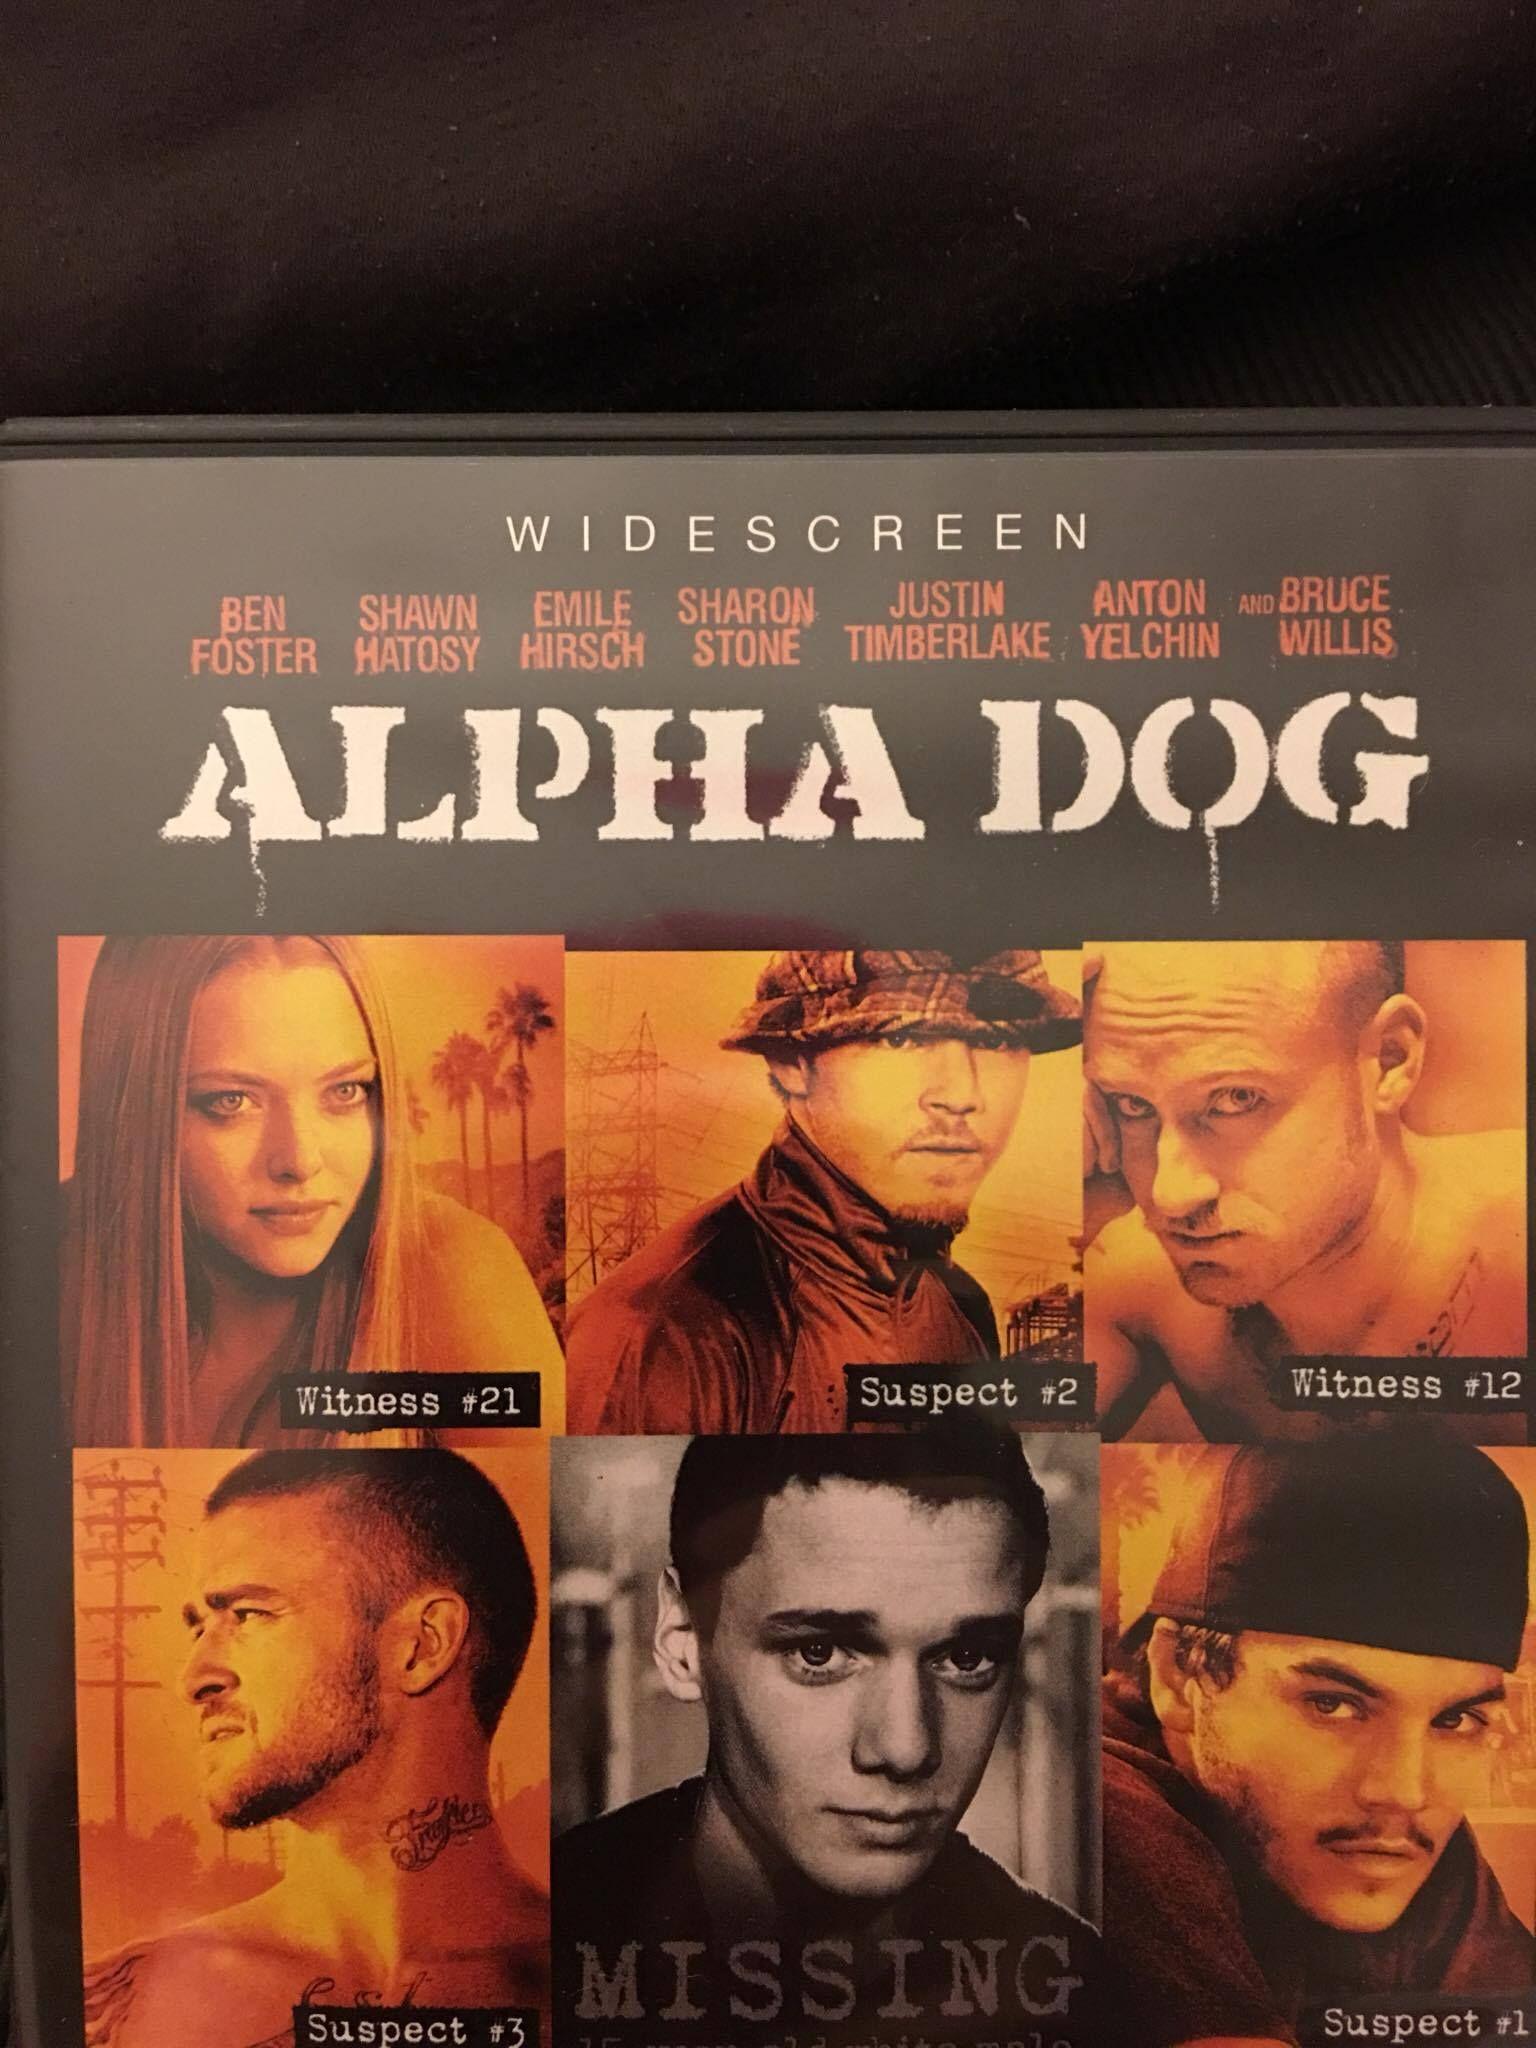 Offline Source Dvd Case Movie Alpha Dog 2007 Universal Studios Home Entertainment Function Packaging Designer Matthewaa Alpha Dog The Fosters Willis